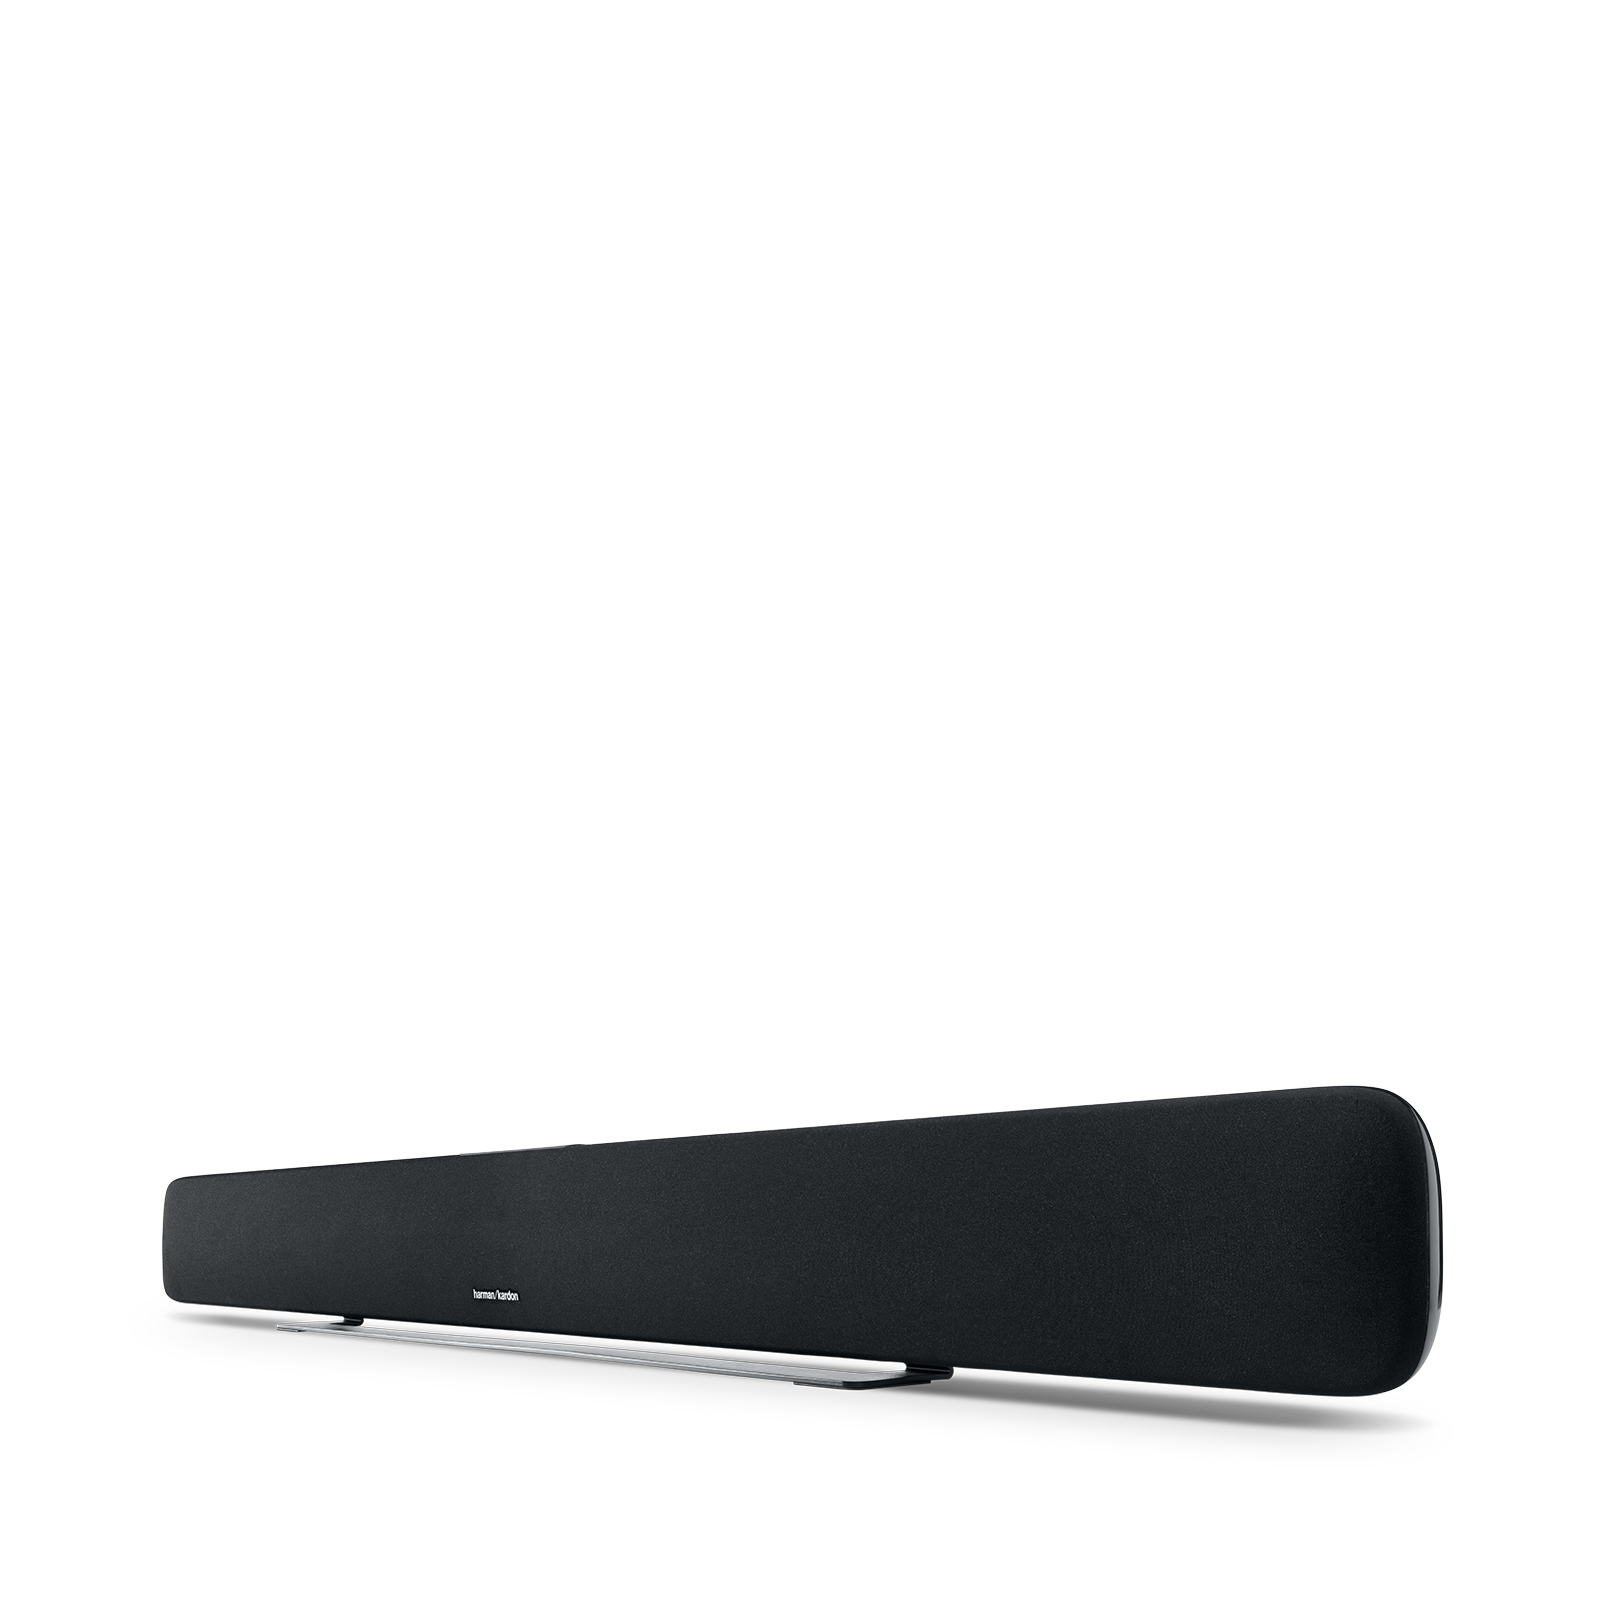 Omni Bar Plus - Black - Wireless HD Soundbar - Detailshot 1